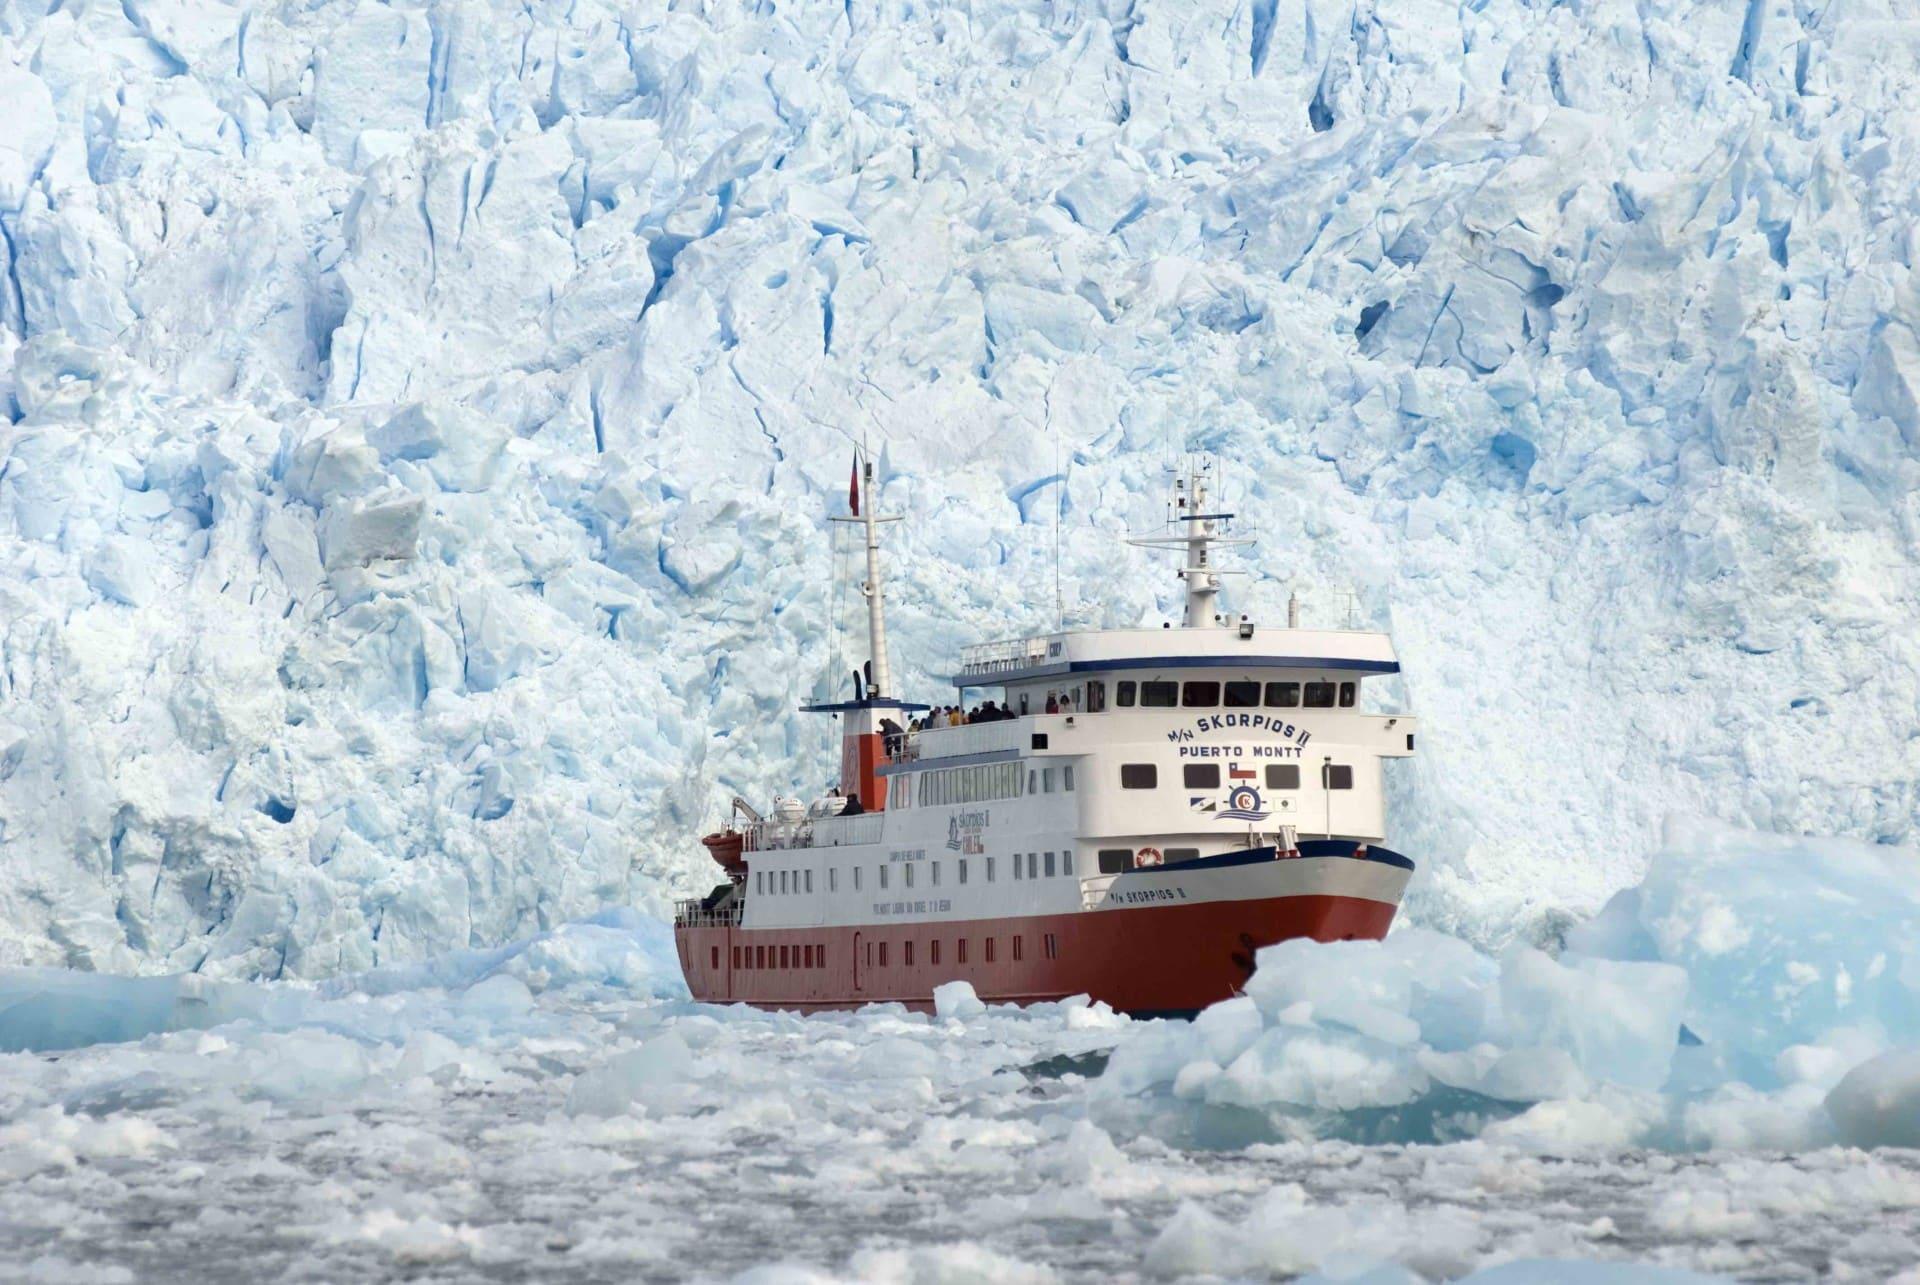 Glacier San Rafael Patagonie Chilienne